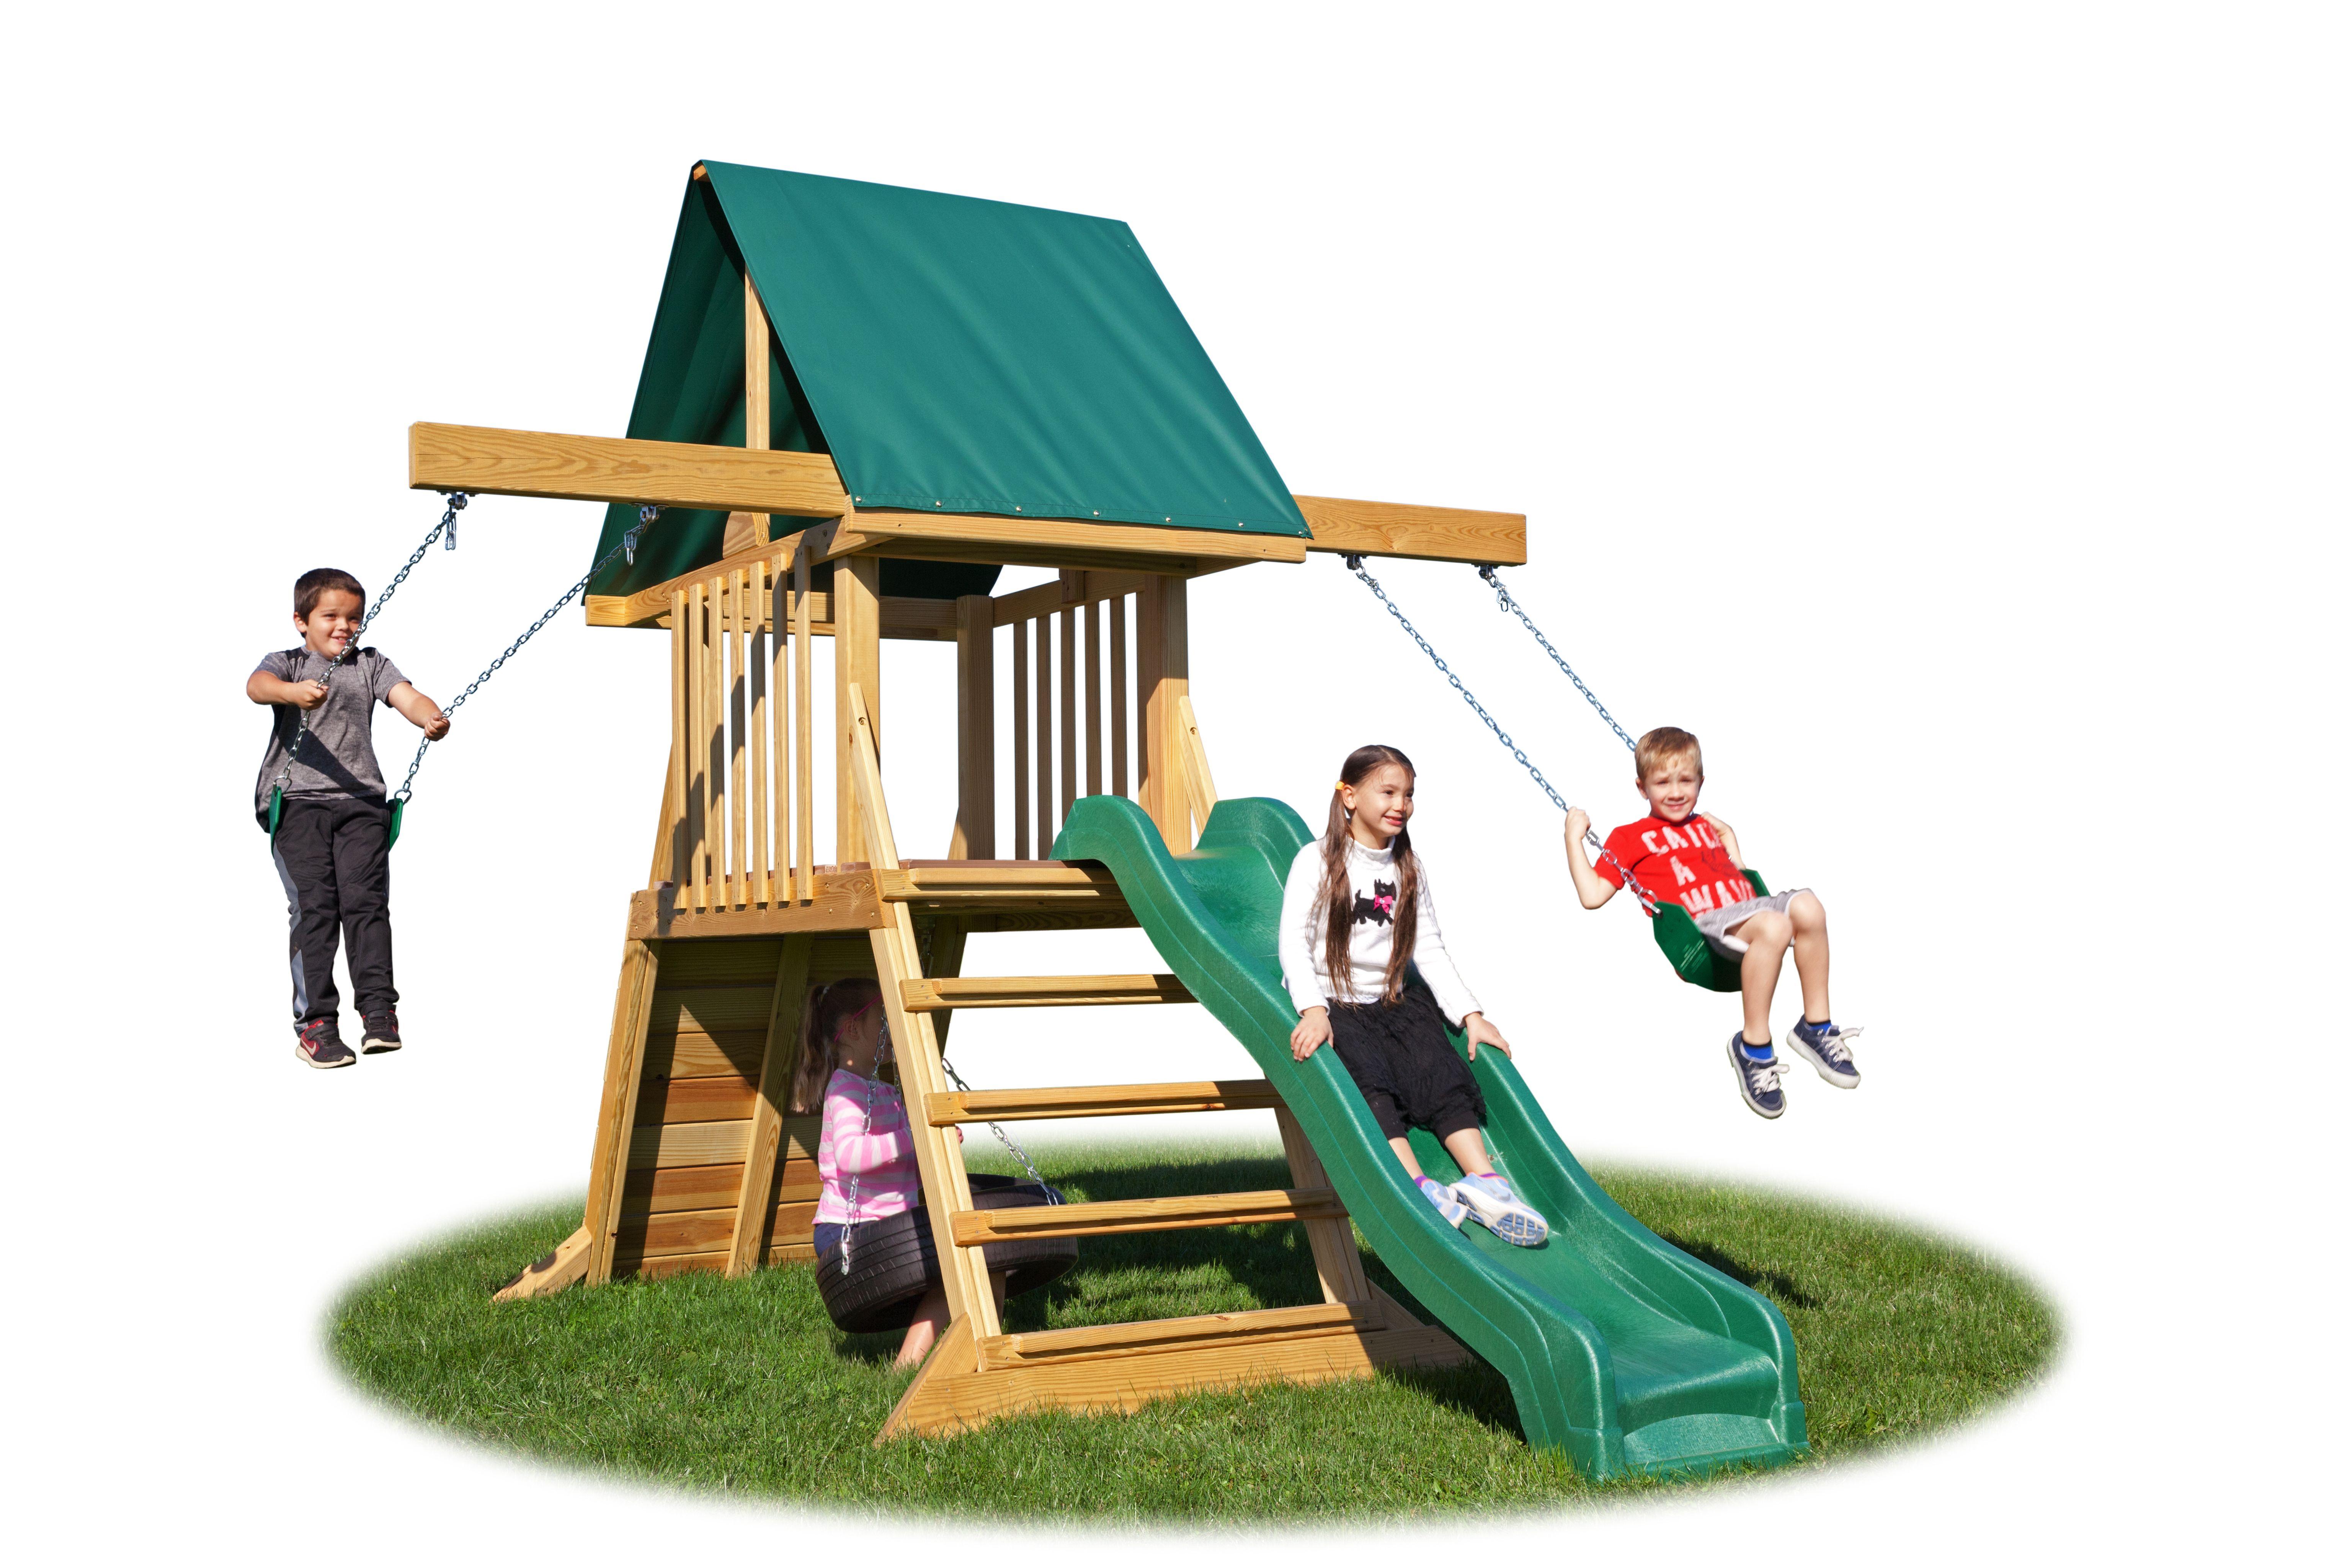 Cliff Climb Compact Wooden Backyard Playset Yardcraft Backyard Playset Play Swing Set Swing Set